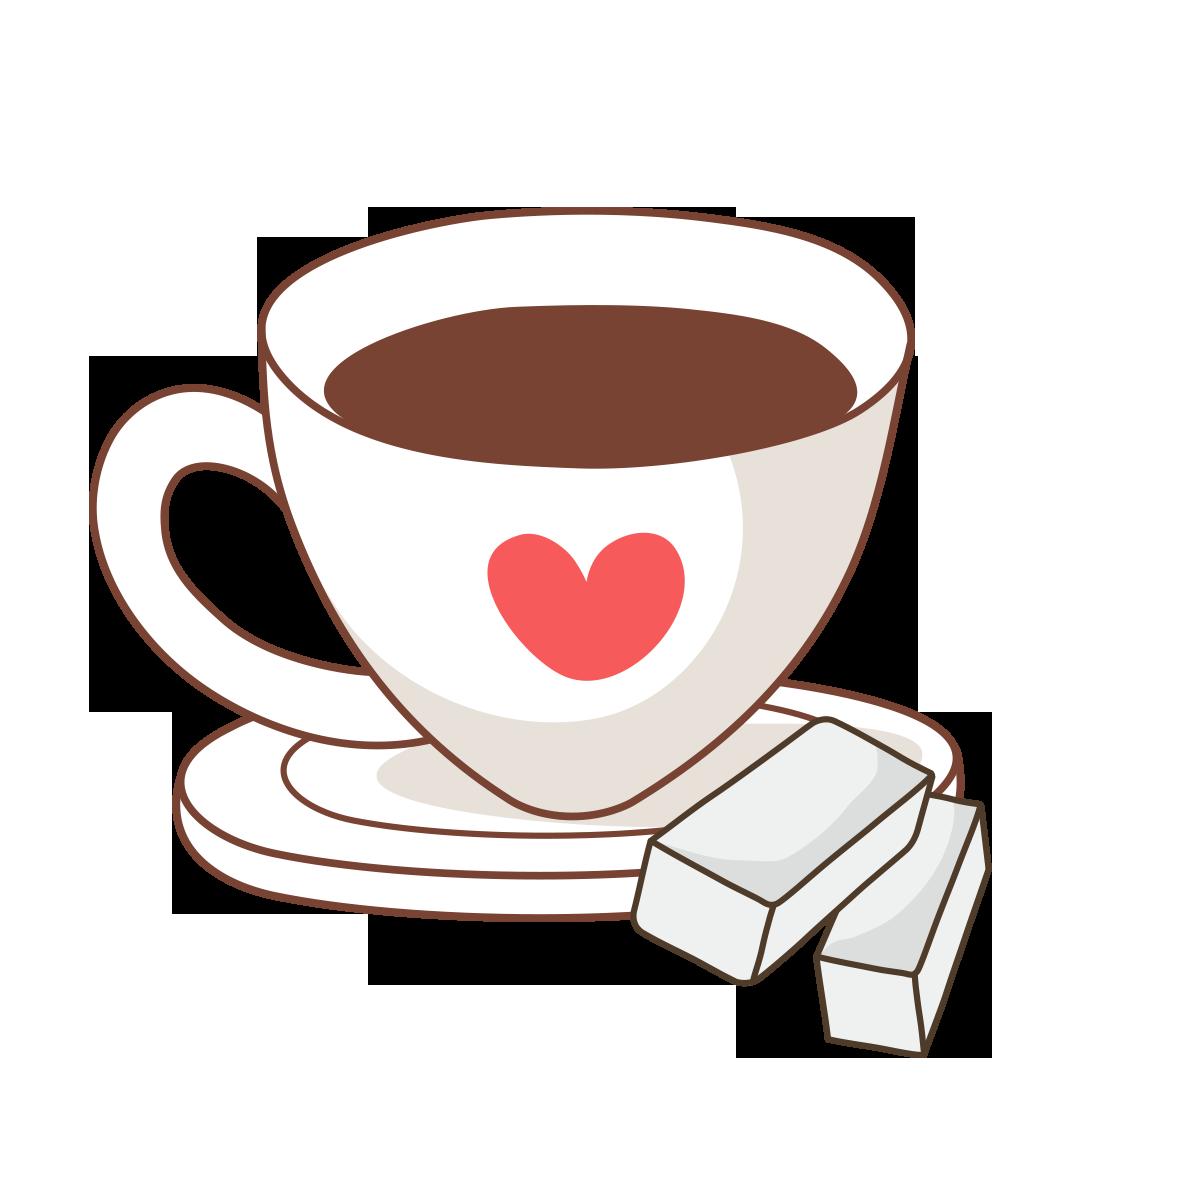 Clipart coffee caffeine, Picture #459908 clipart coffee caffeine.